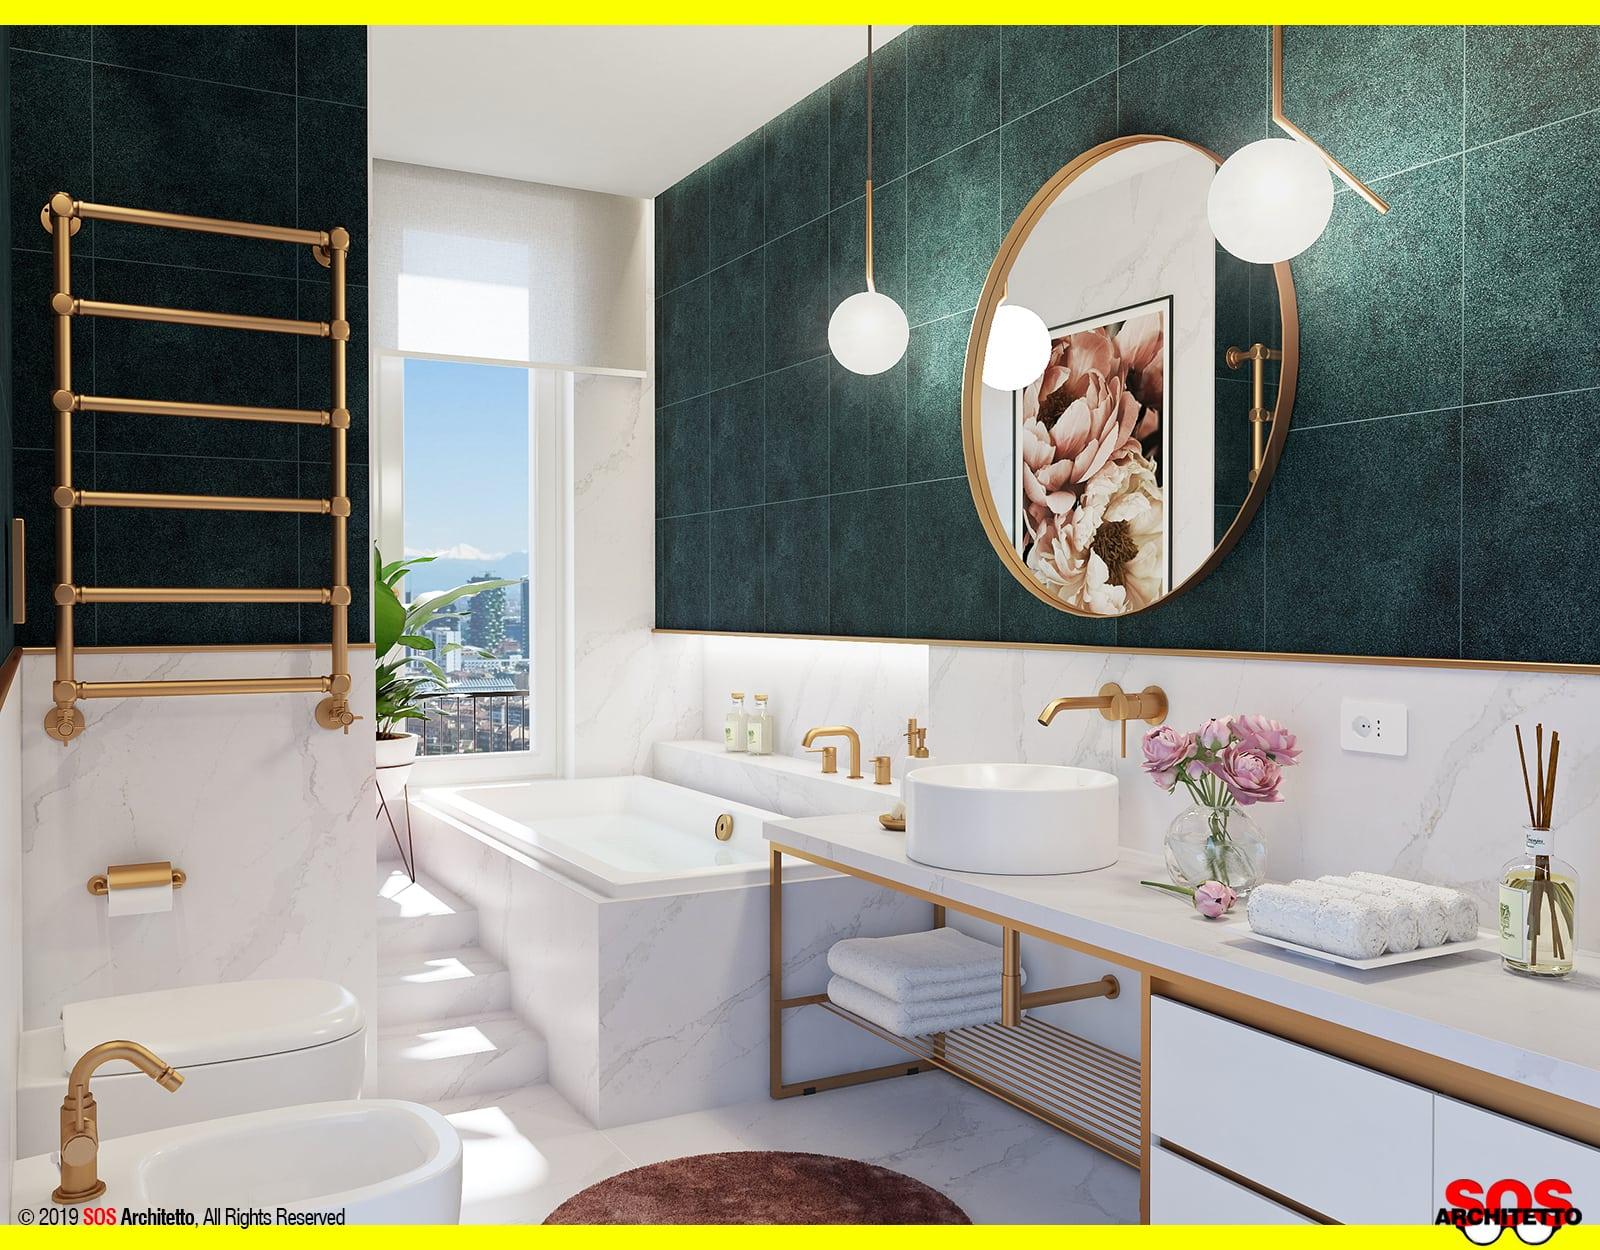 bagno-vasca-sotto-finestra-02